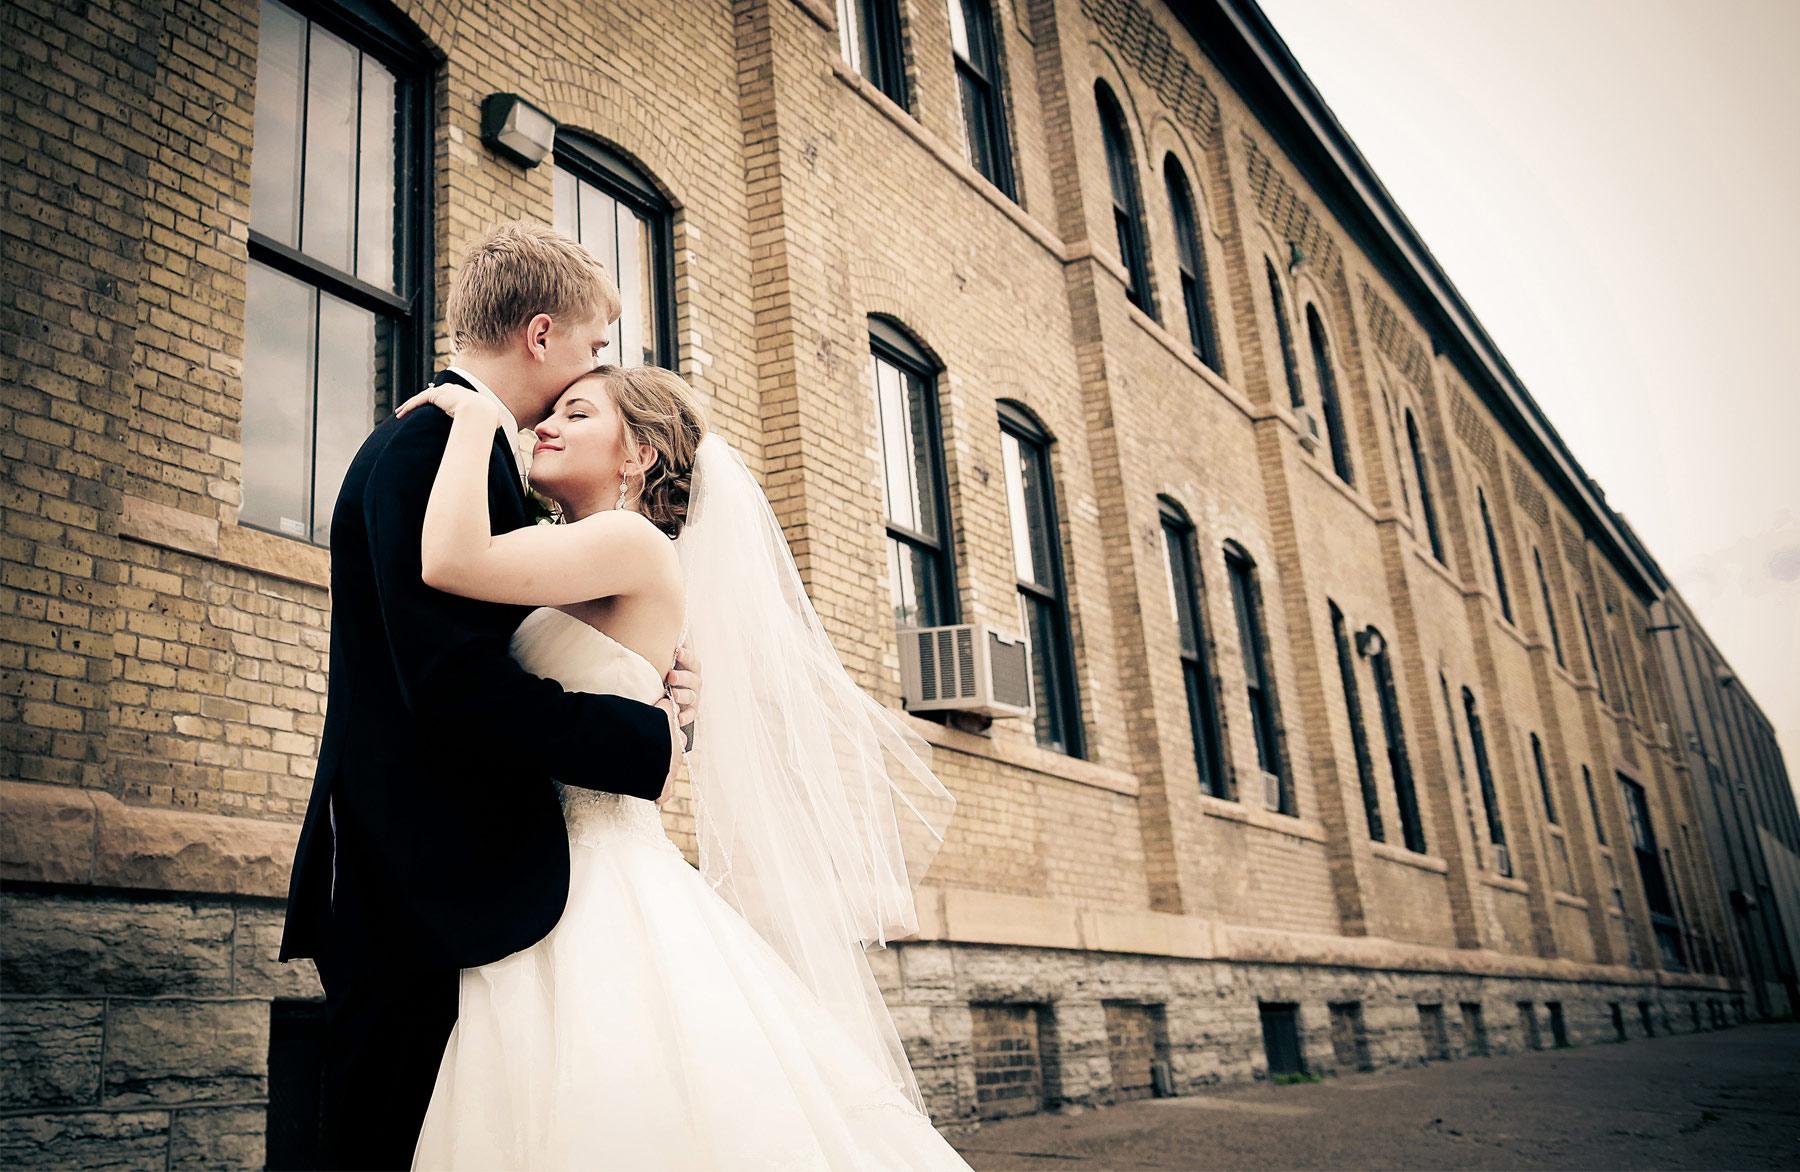 07-Minneapolis-Minnesota-Wedding-Photography-by-Vick-Photography-Courtney-&-John.jpg